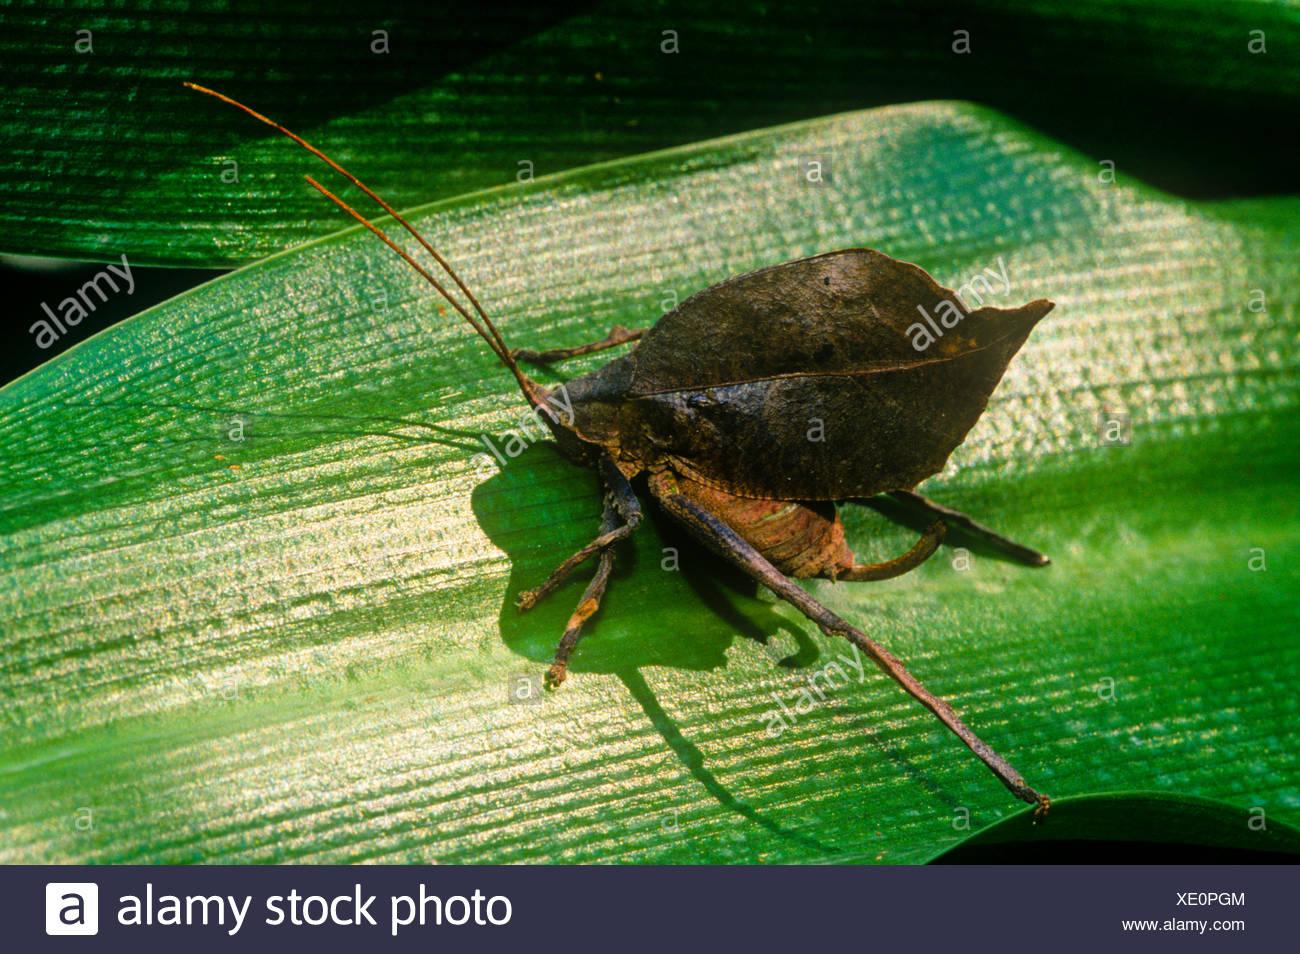 Dead Leaf Mimic katydid, Typophyllum sp. (Tettigoniidae), Camouflaged brown, Costa Rica. - Stock Image